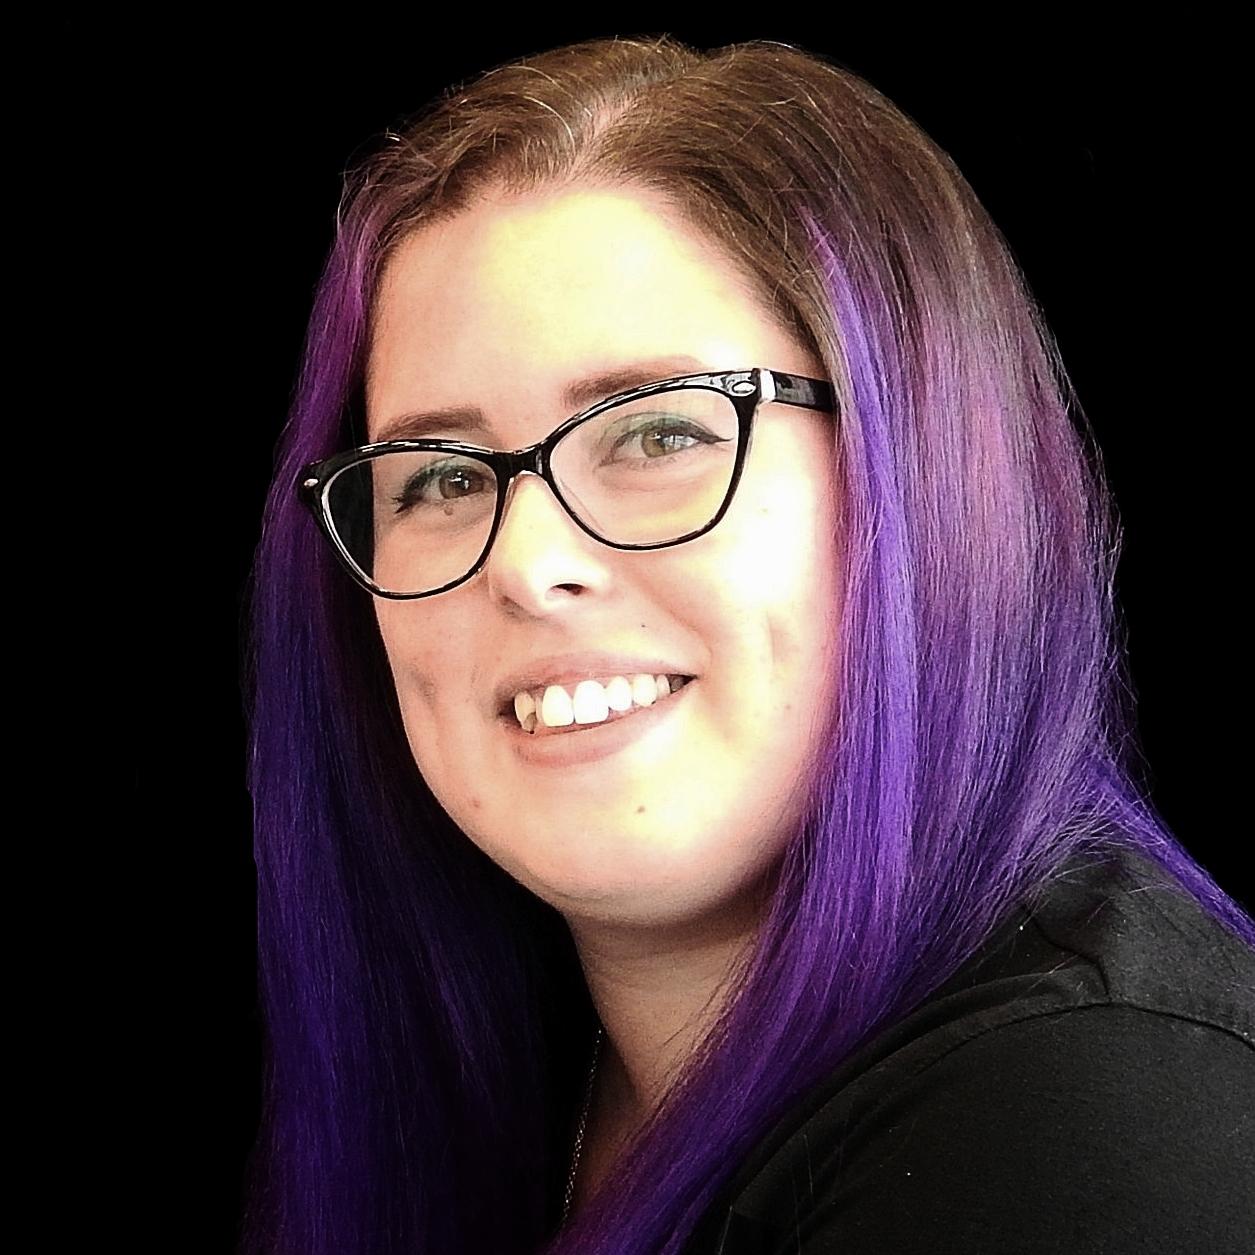 Ms. sarah bunder - Certified OSINT Specialist, Supervisor